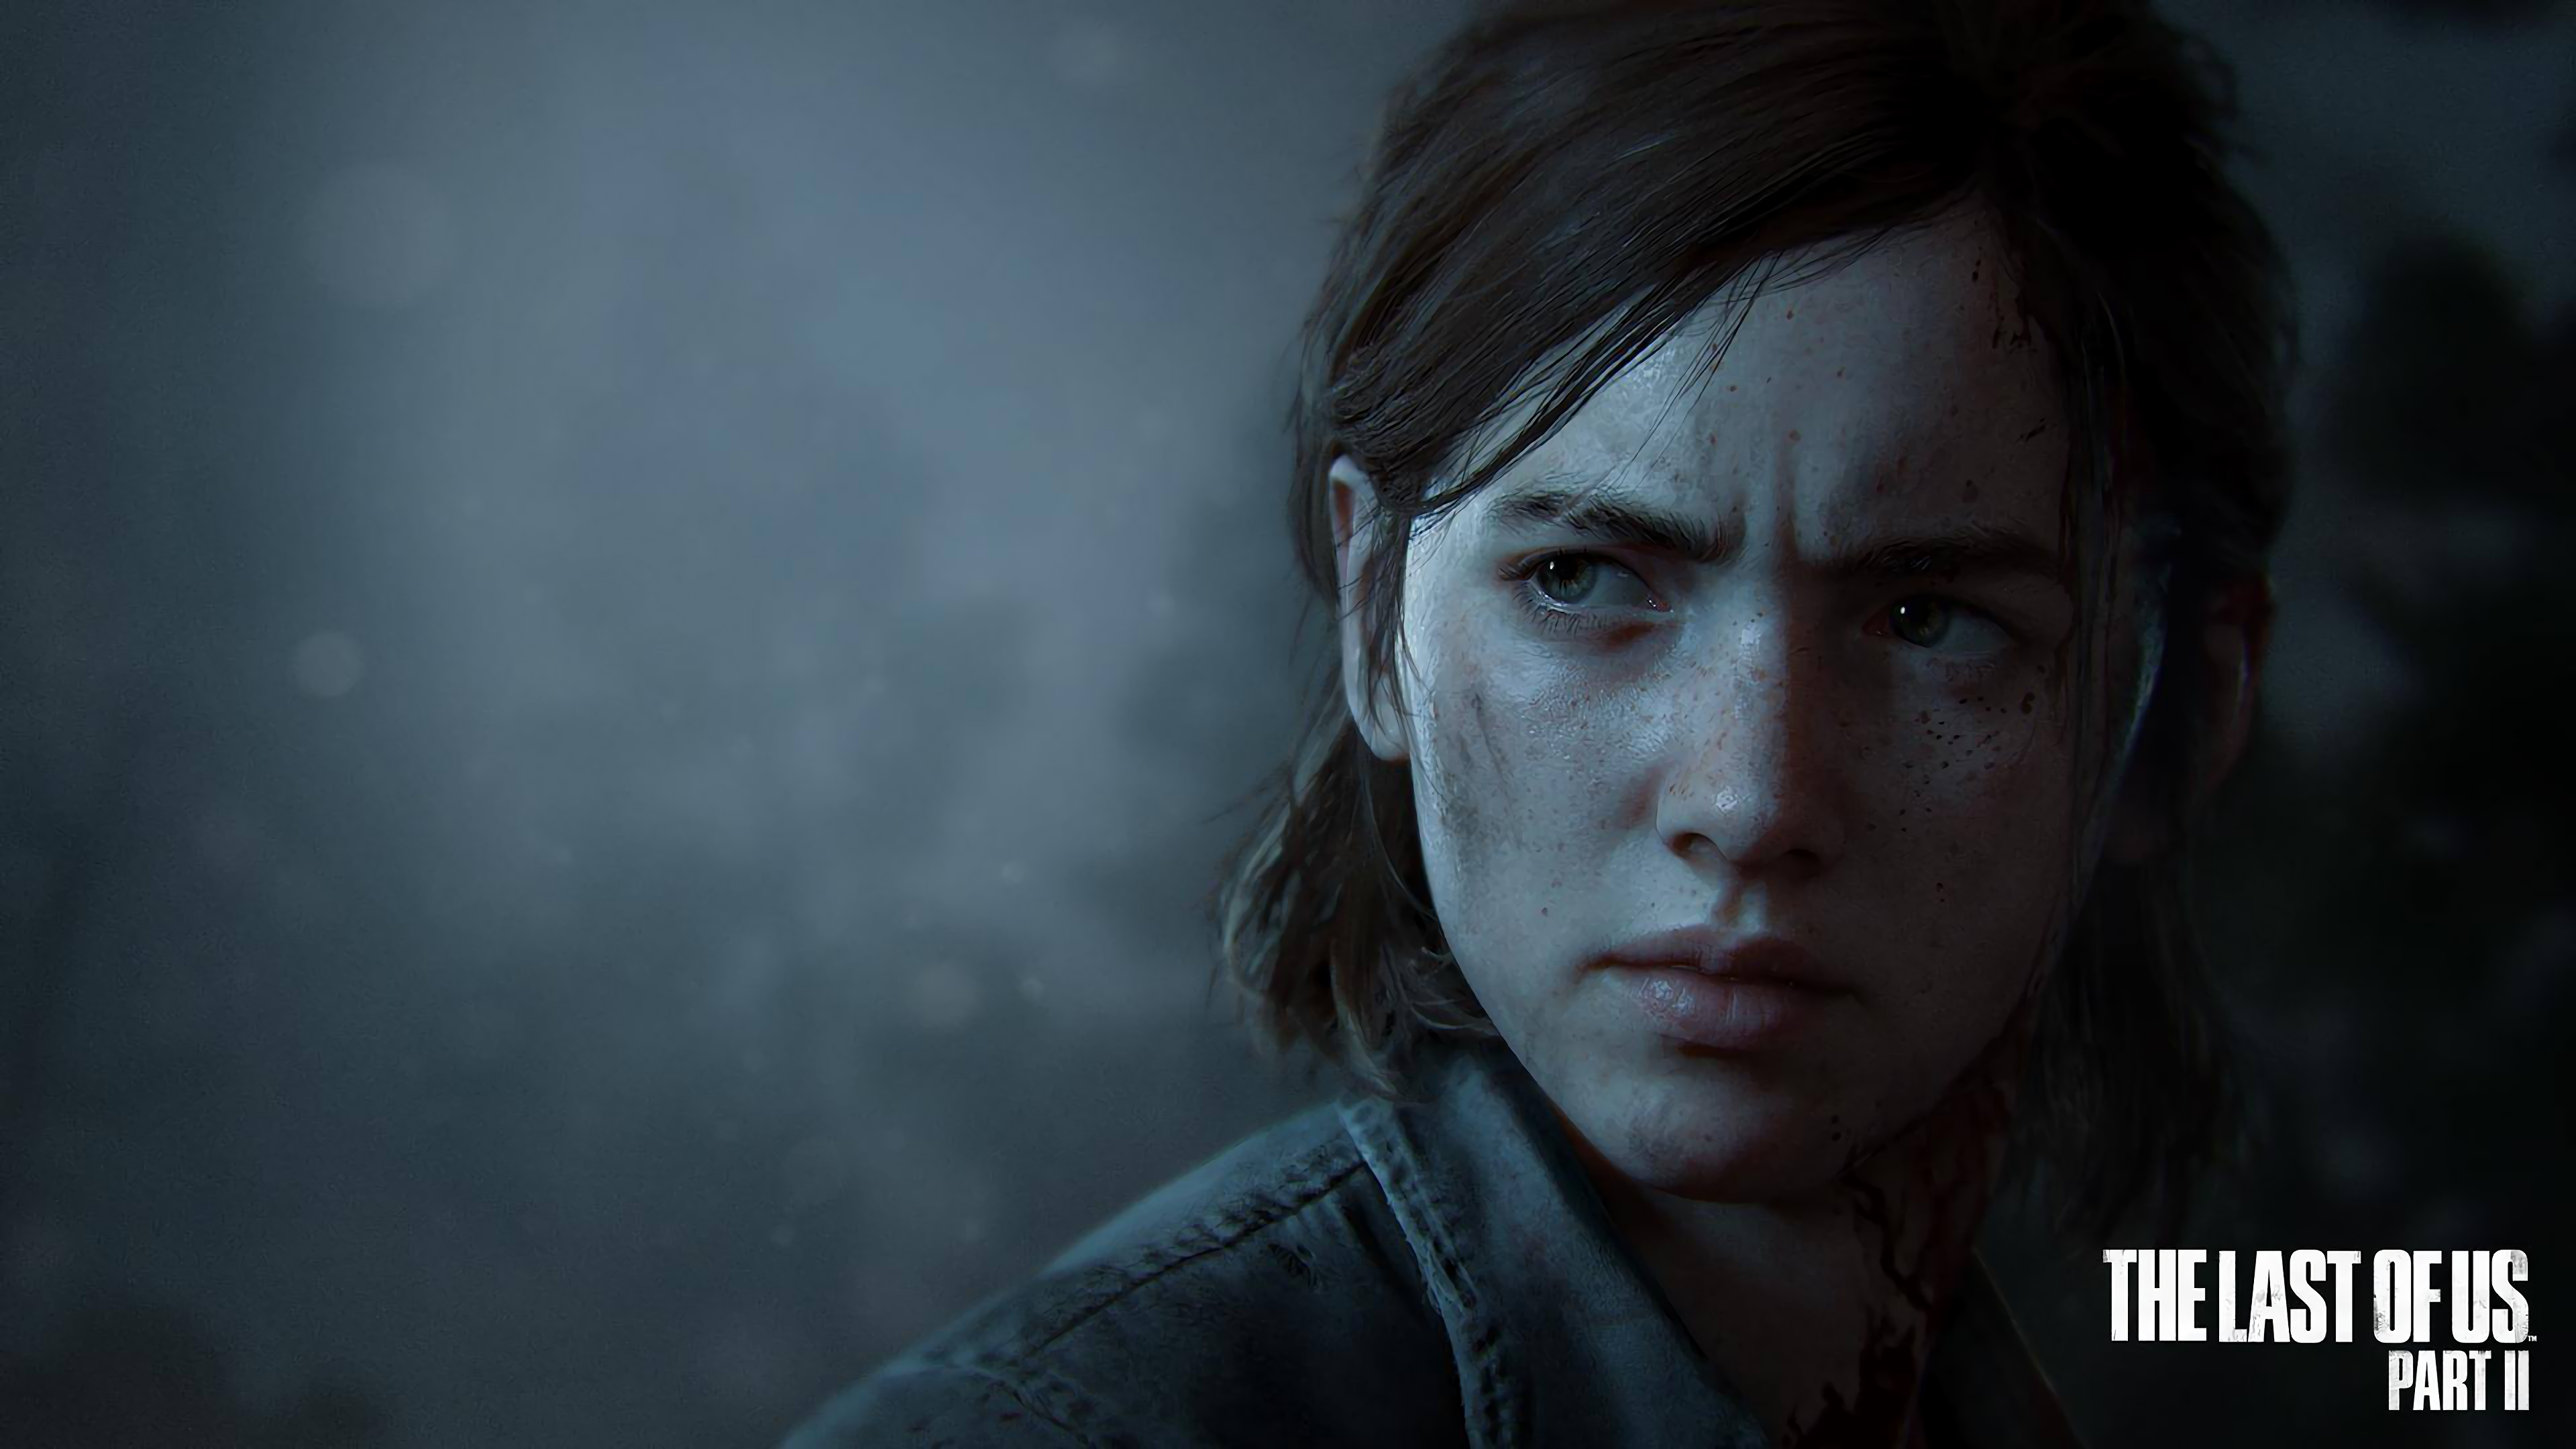 The Last of Us Part 2 Ellie 4K Wallpaper 1 3840x2160